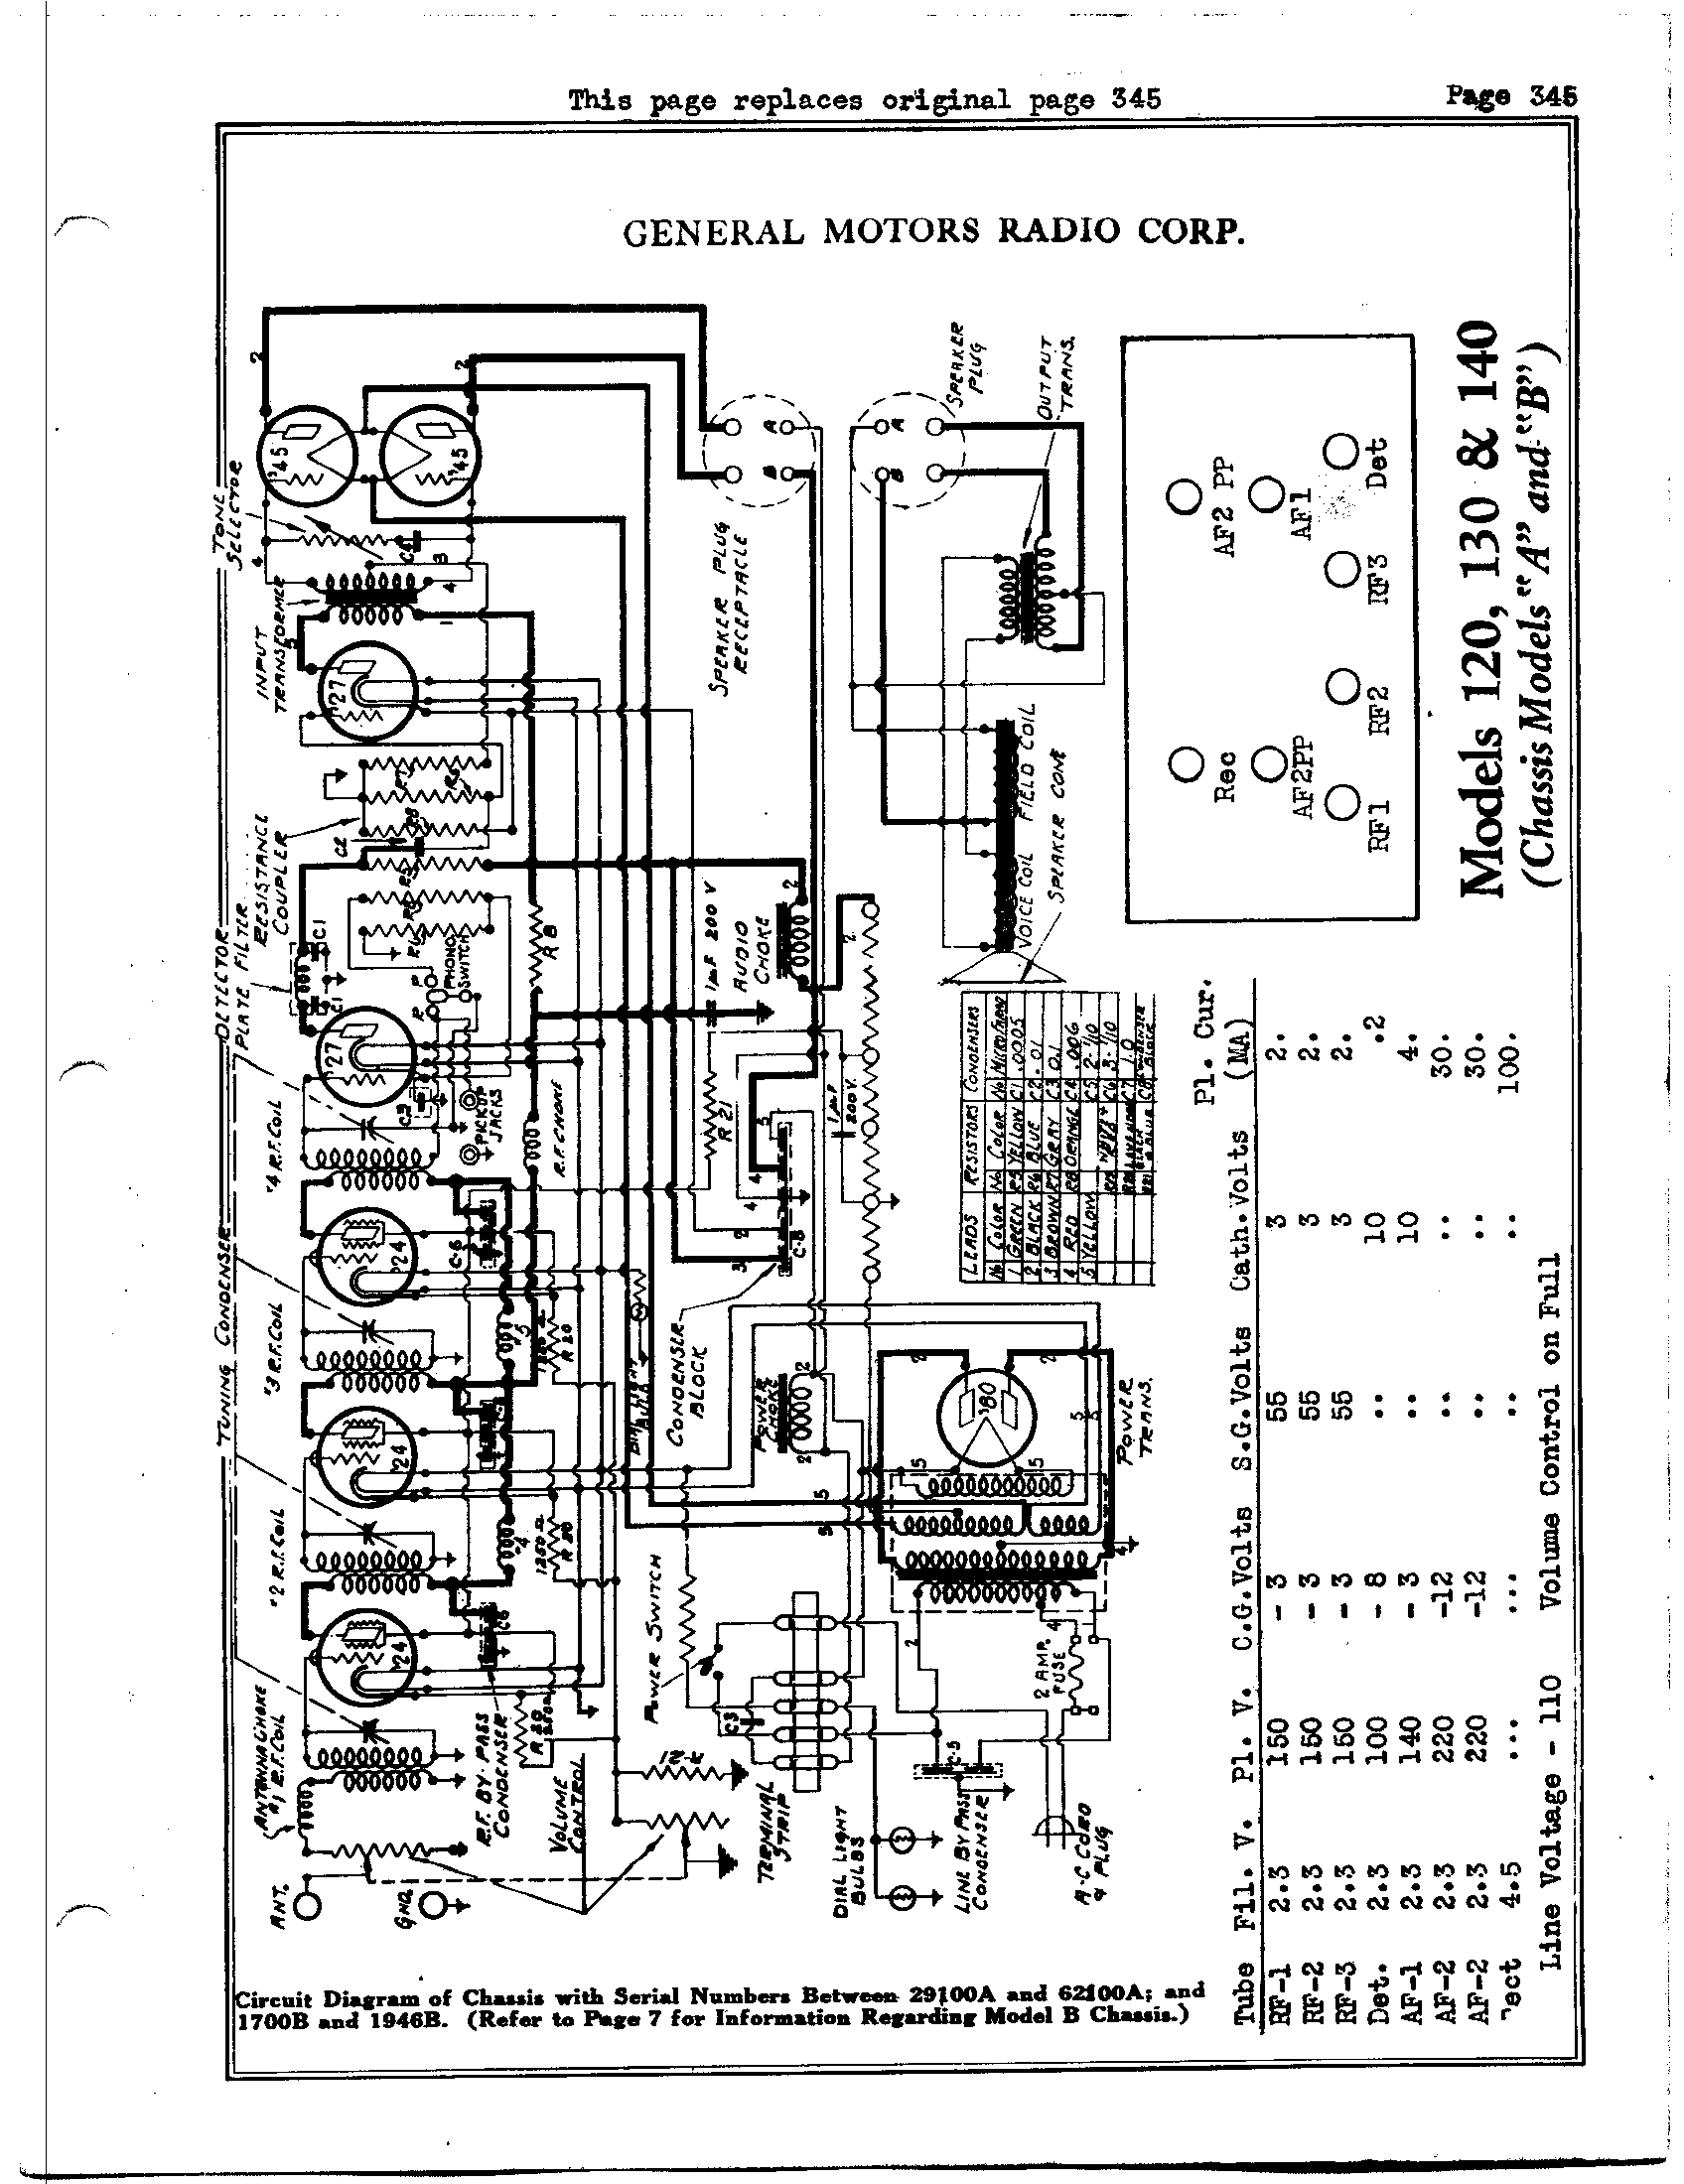 general_motors_radio_corp_140_pg2 1 general motors radio corp 140 antique electronic supply